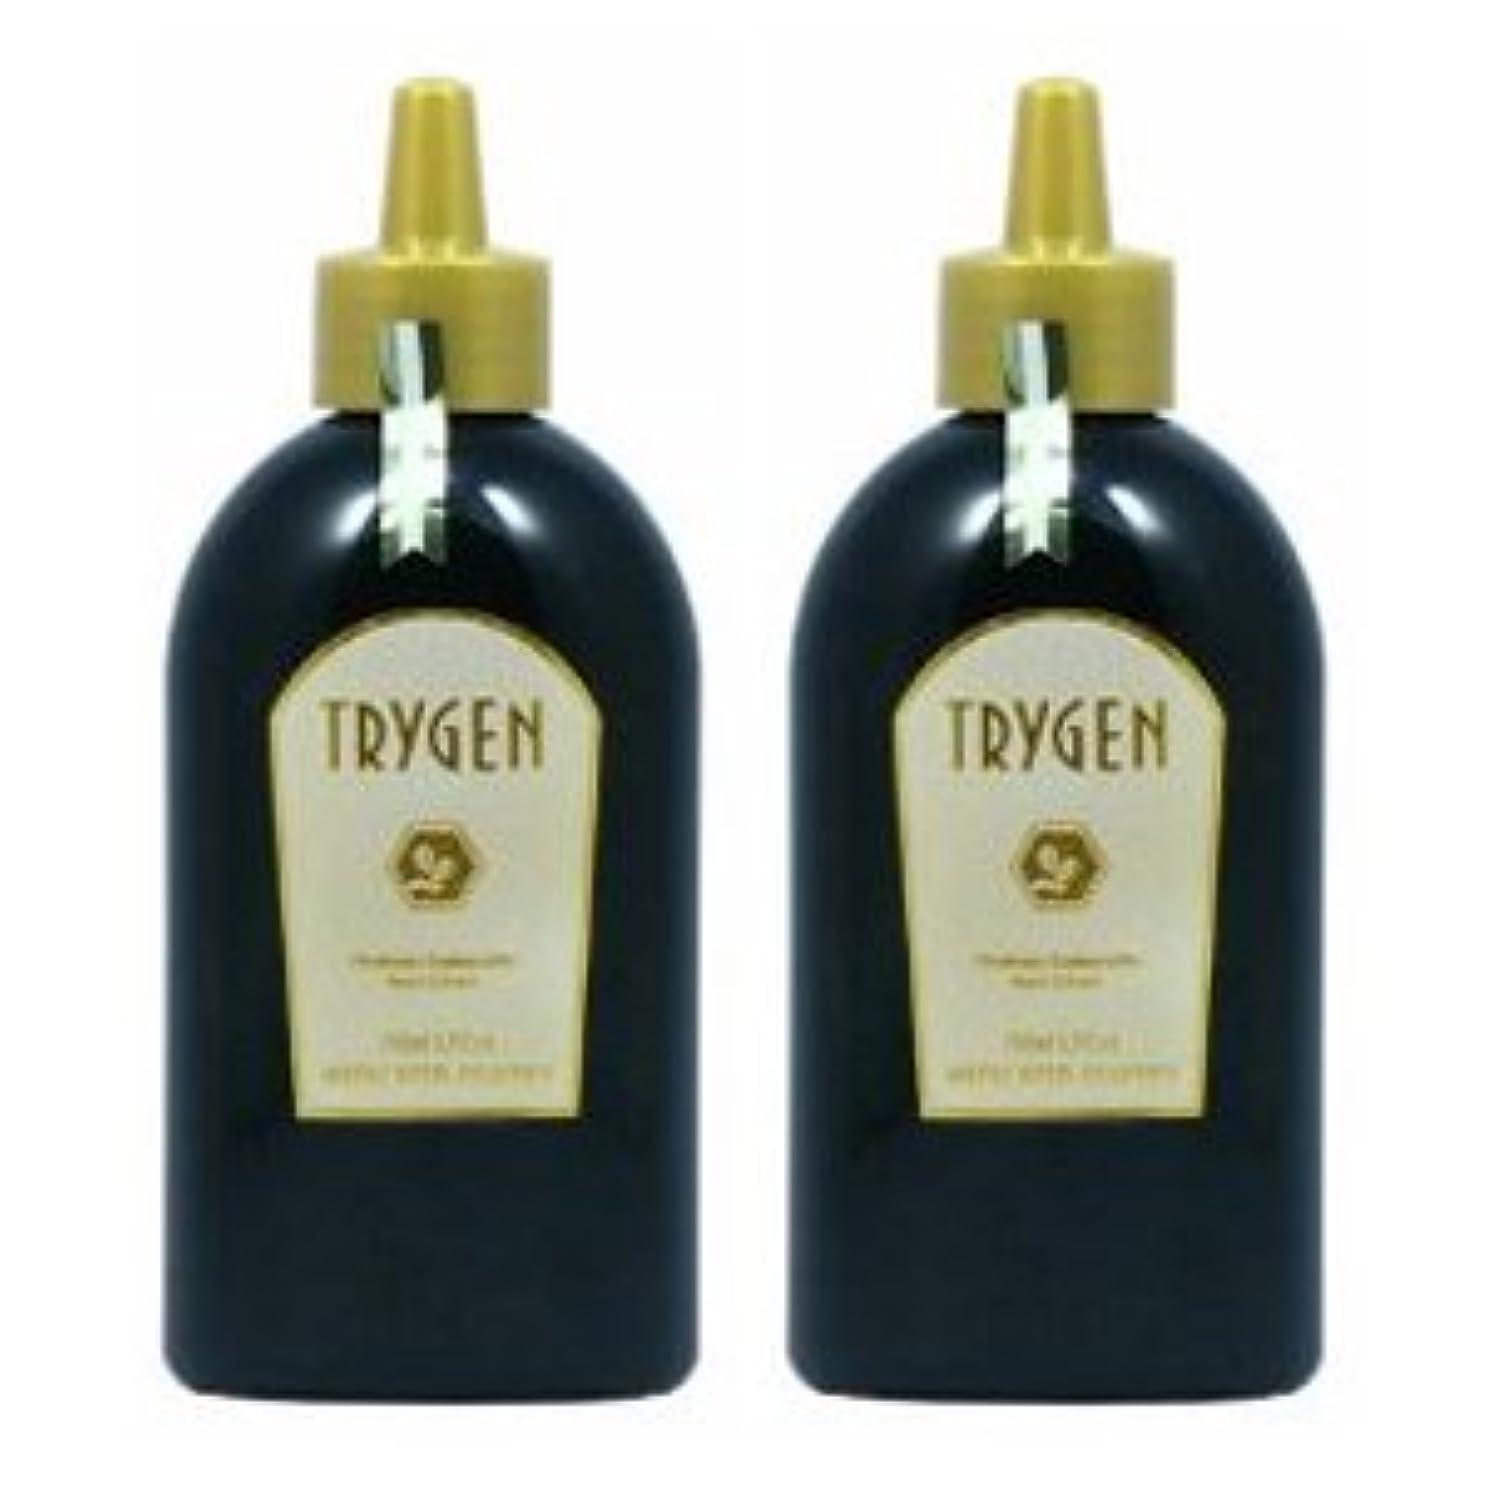 【X2個セット】 ナカノ トライゲン スキャルプエッセンス(育毛剤)200ml 医薬部外品